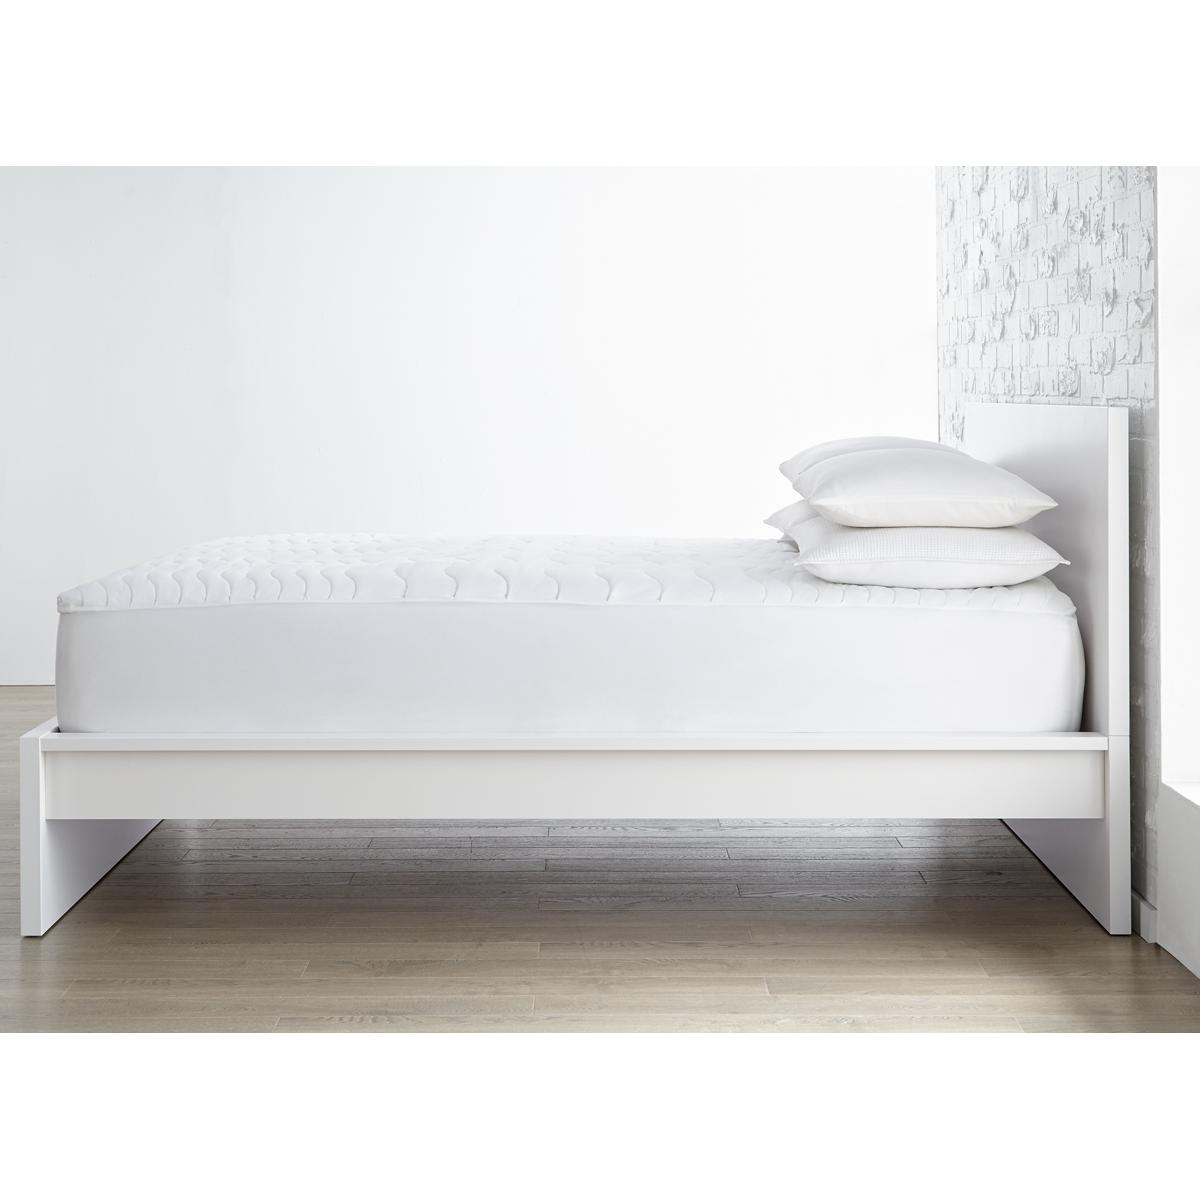 ... Twin Size; Sunbeam health™ RESTORE™ Heated Mattress Pad, ...